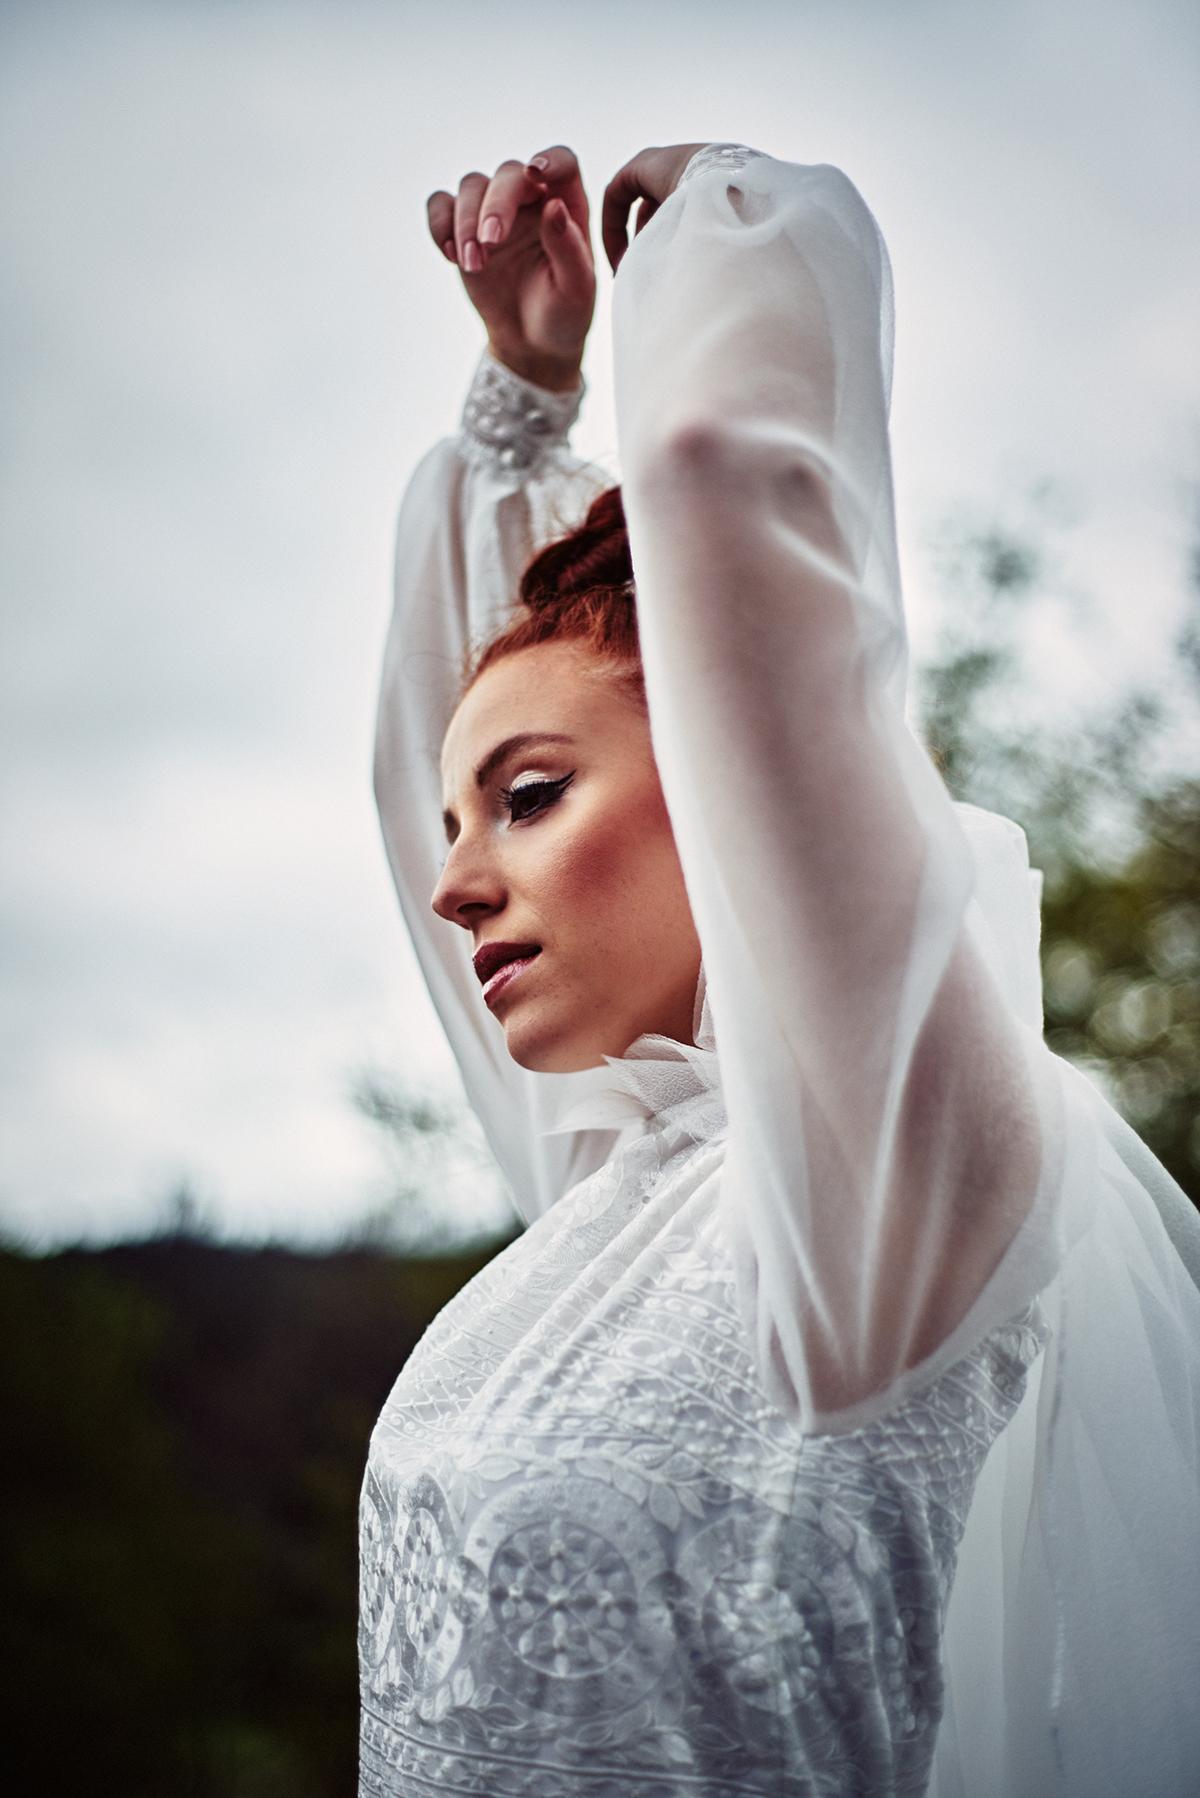 Vestido: Juana Rique | Foto: Manu Cruz